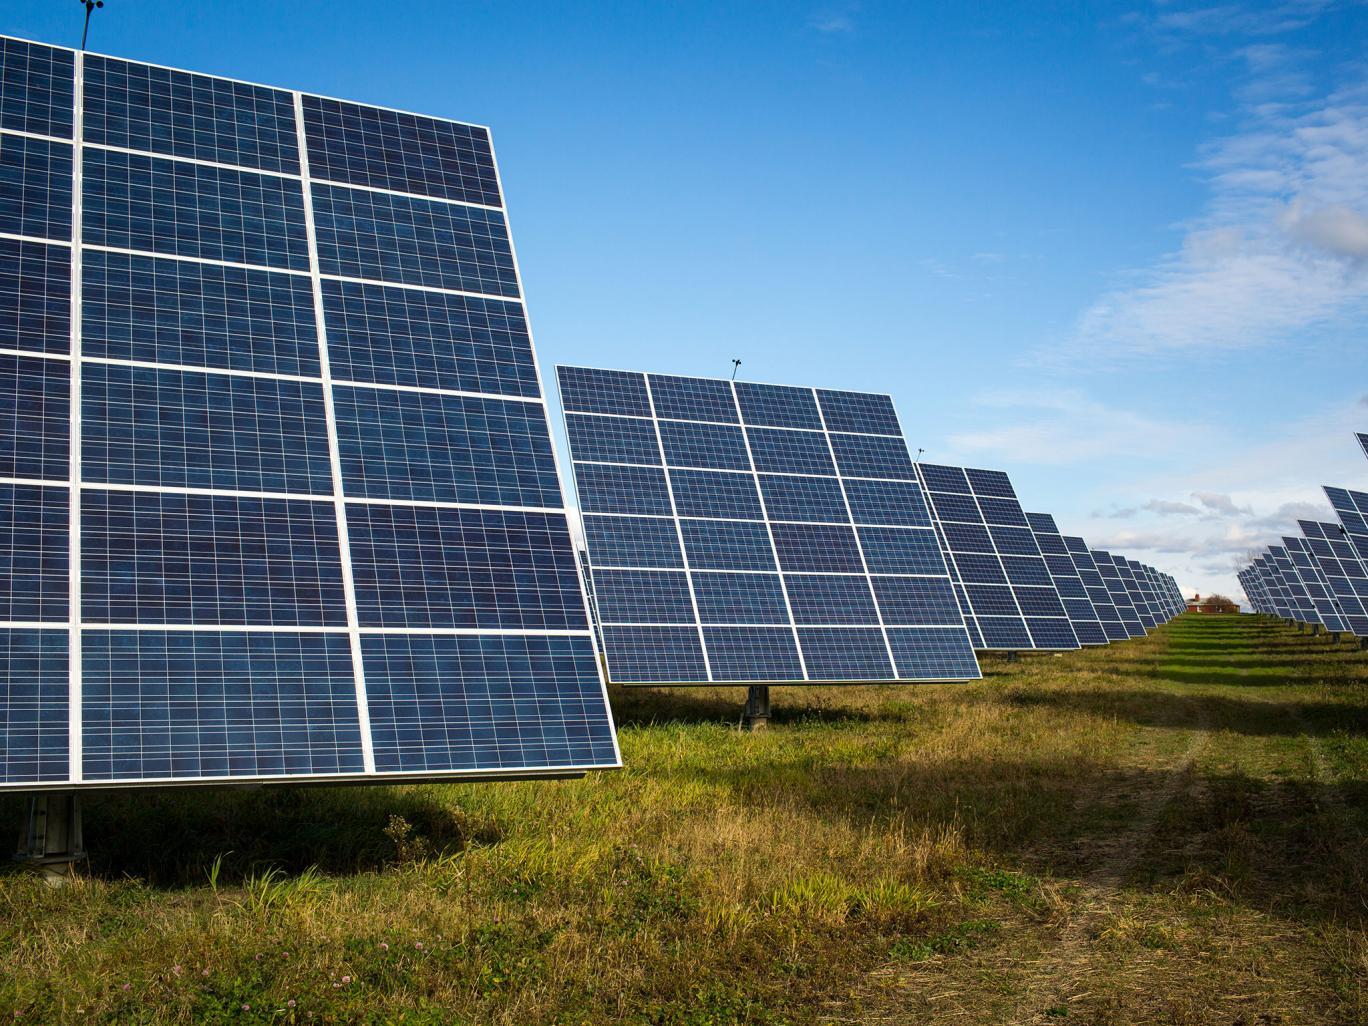 solar panels duties and tariffs.jpg